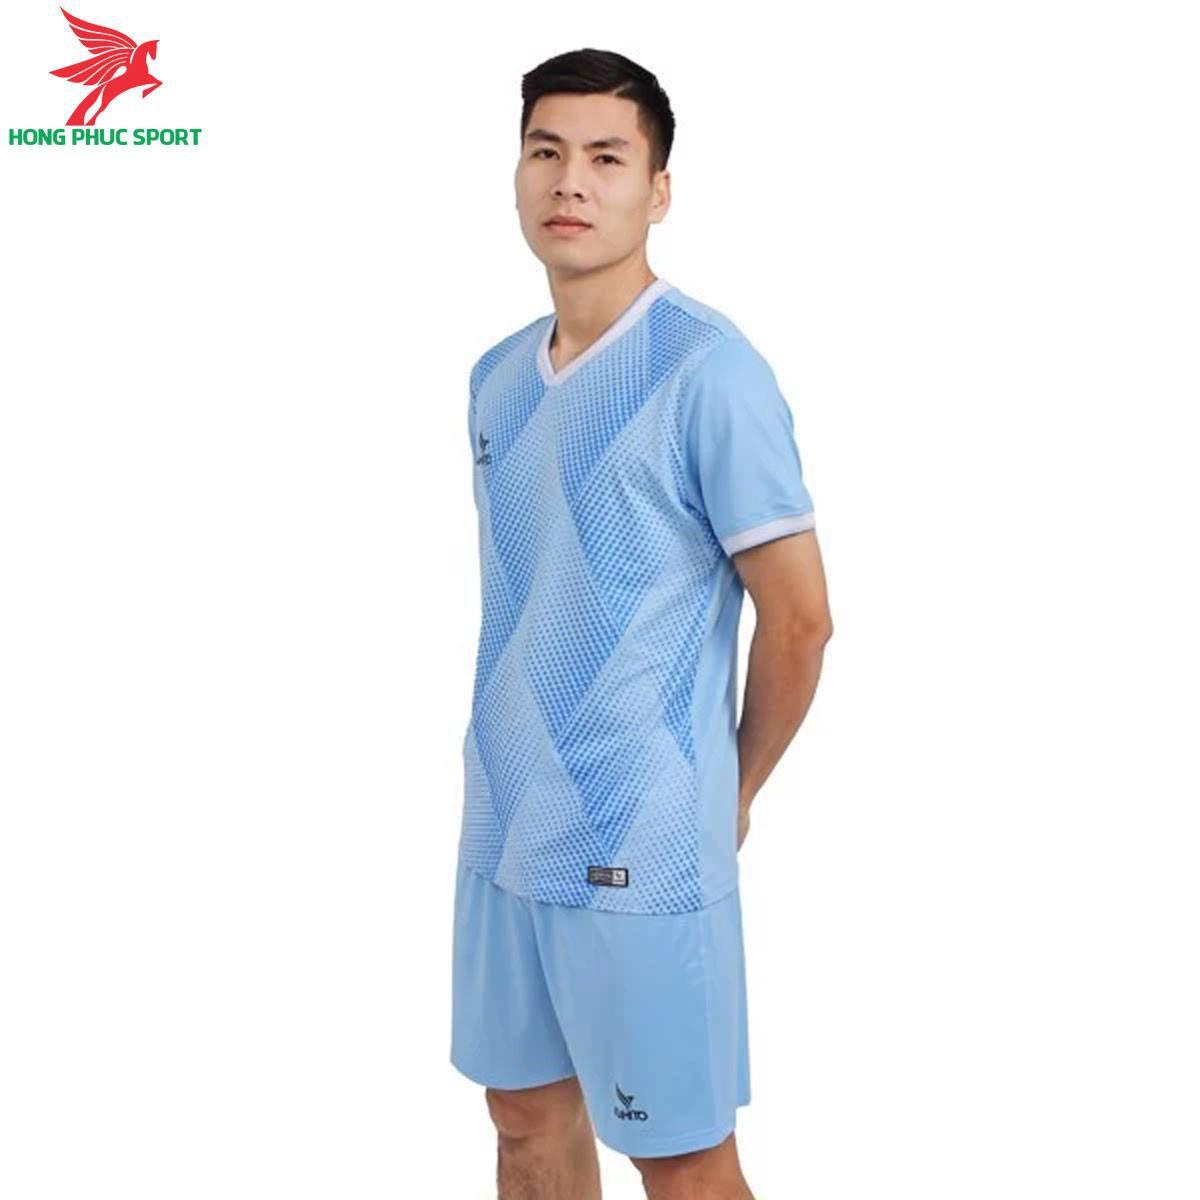 https://cdn.hongphucsport.com/unsafe/s4.shopbay.vn/files/285/ao-khong-logo-kamito-msh2101-mau-xanh-bien-2-6052dc0751c1d.jpg